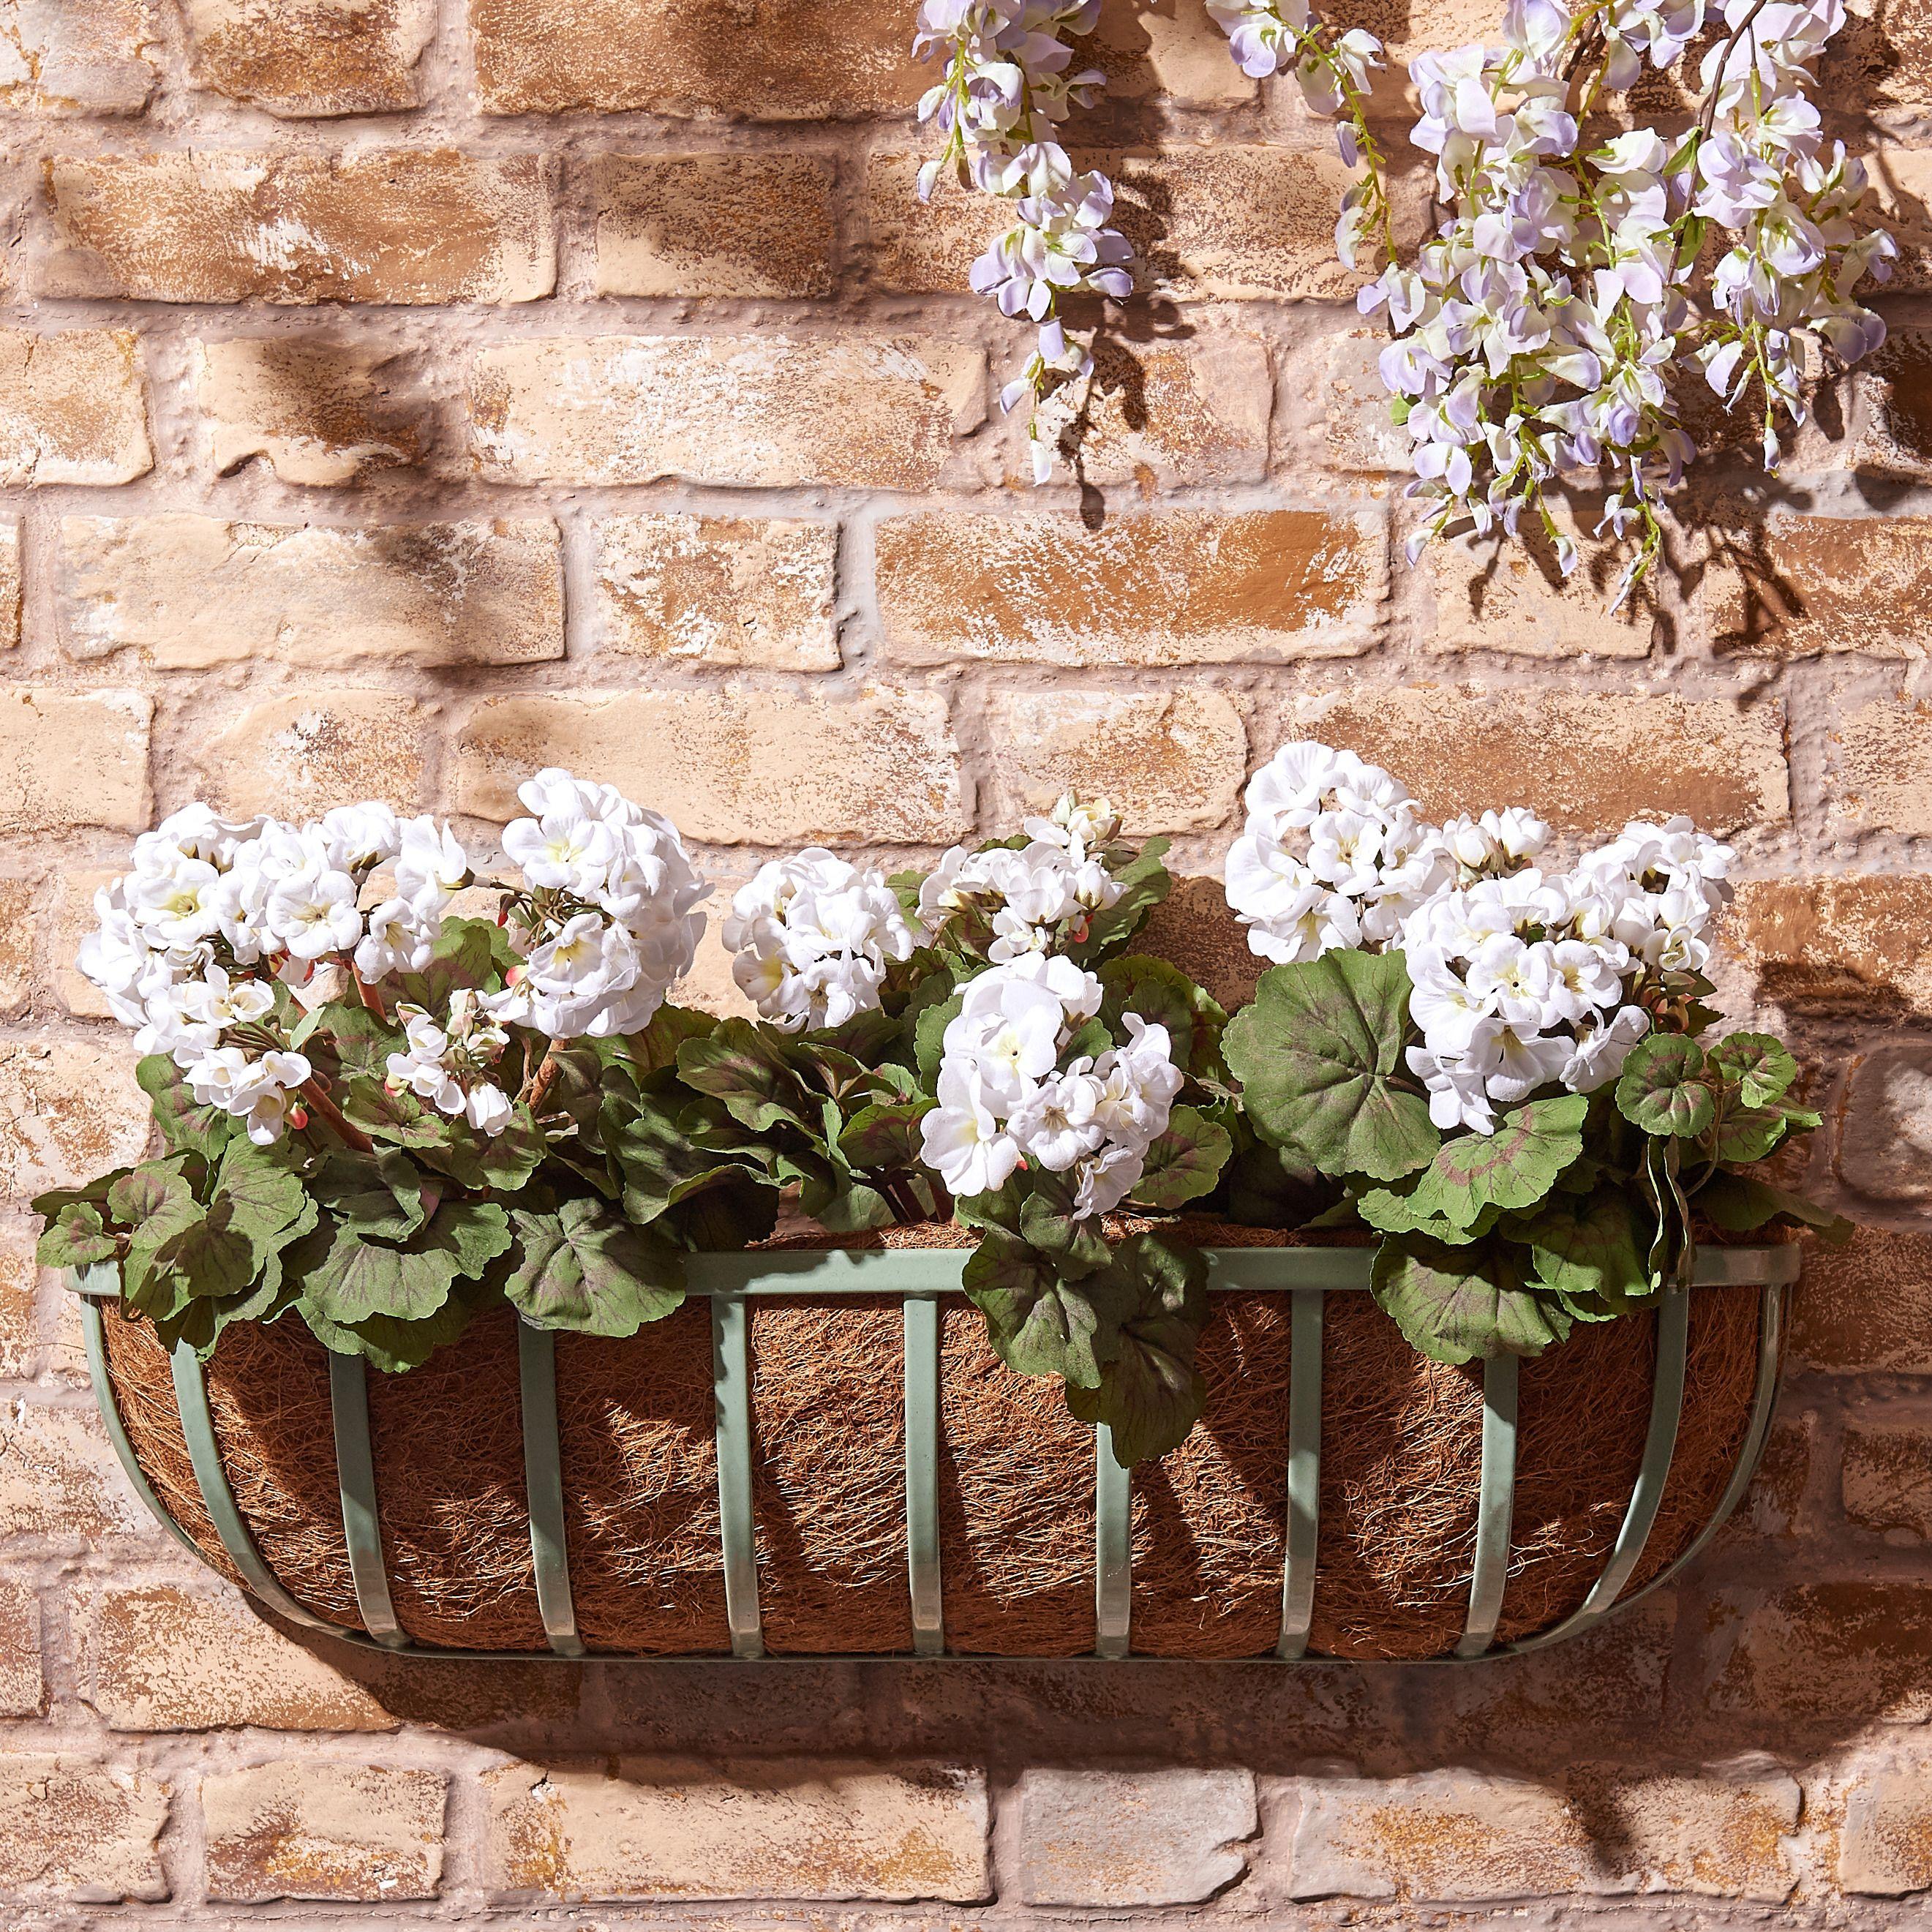 70cm Sage Large Metal Wall Basket with Liner Baskets on